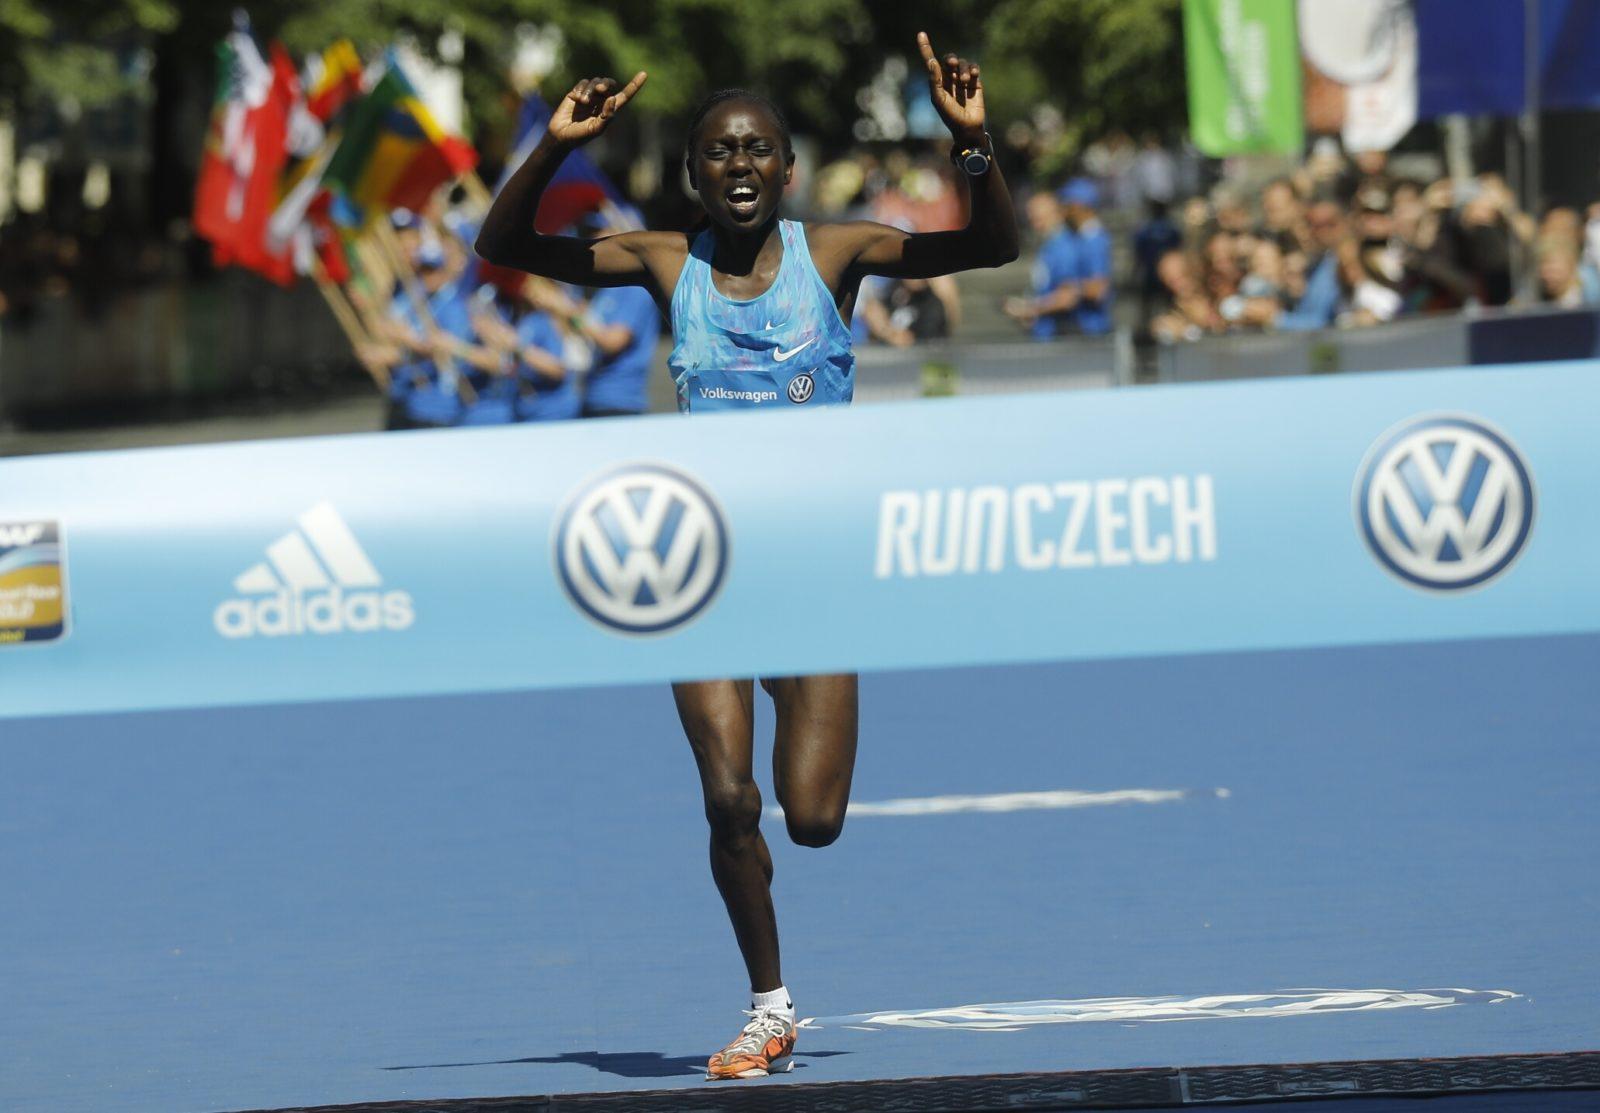 Prague marathon 2018 BORNES JEPKIRUI KITUR | KEN